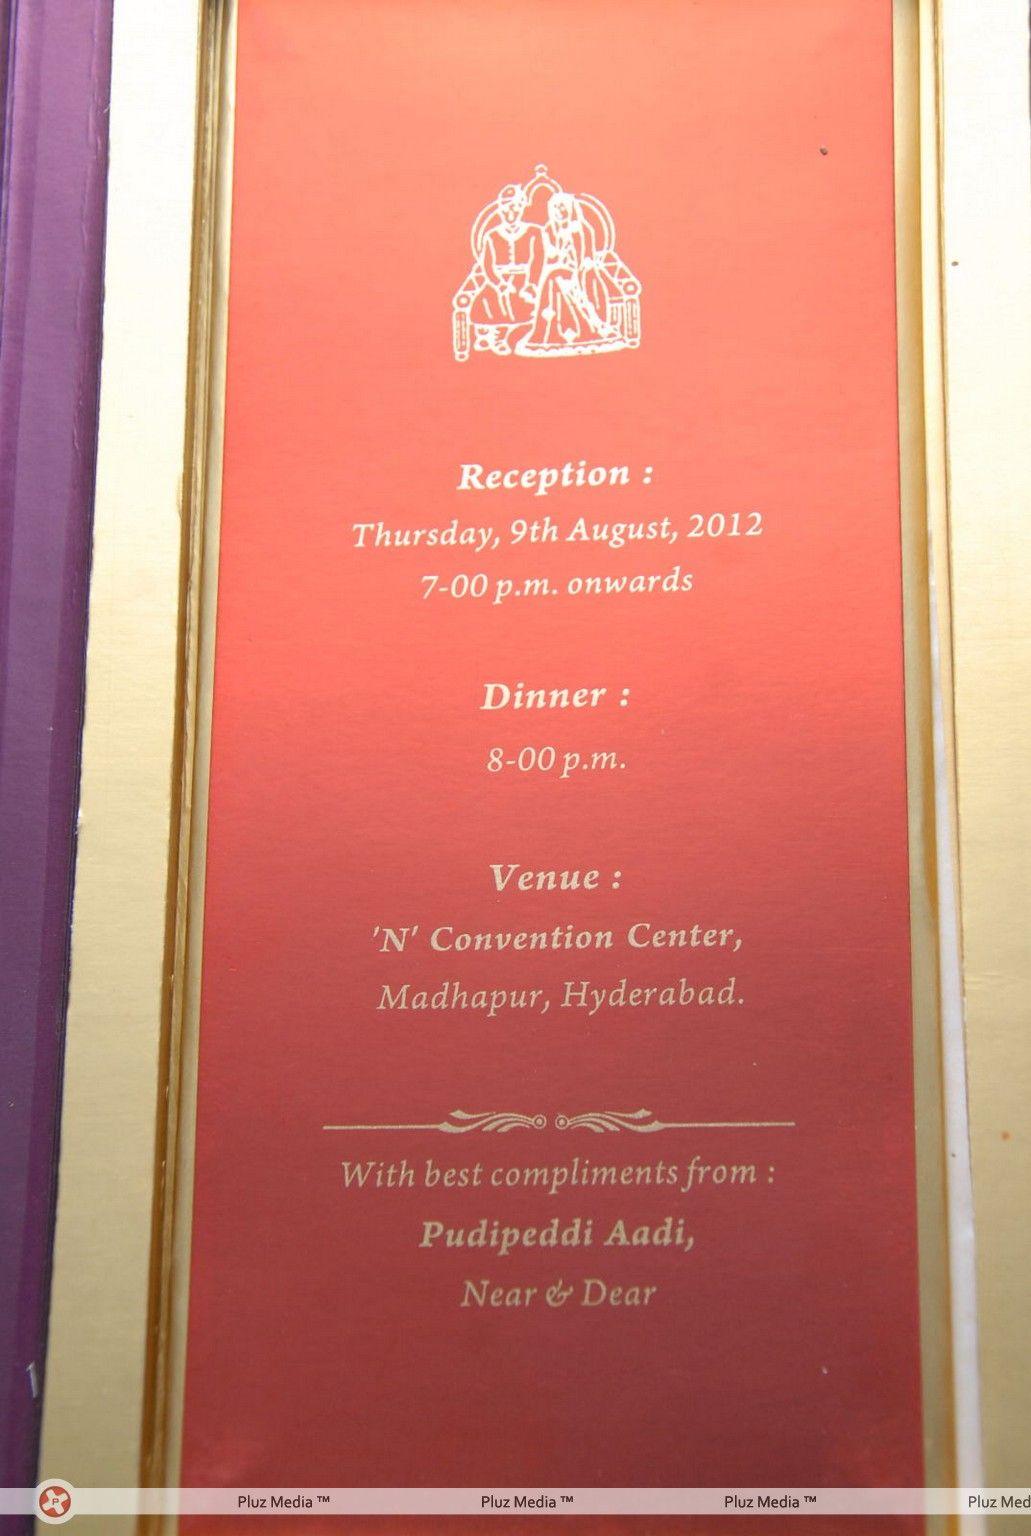 friends wedding invitation wordings in kannada - Picture Ideas ...